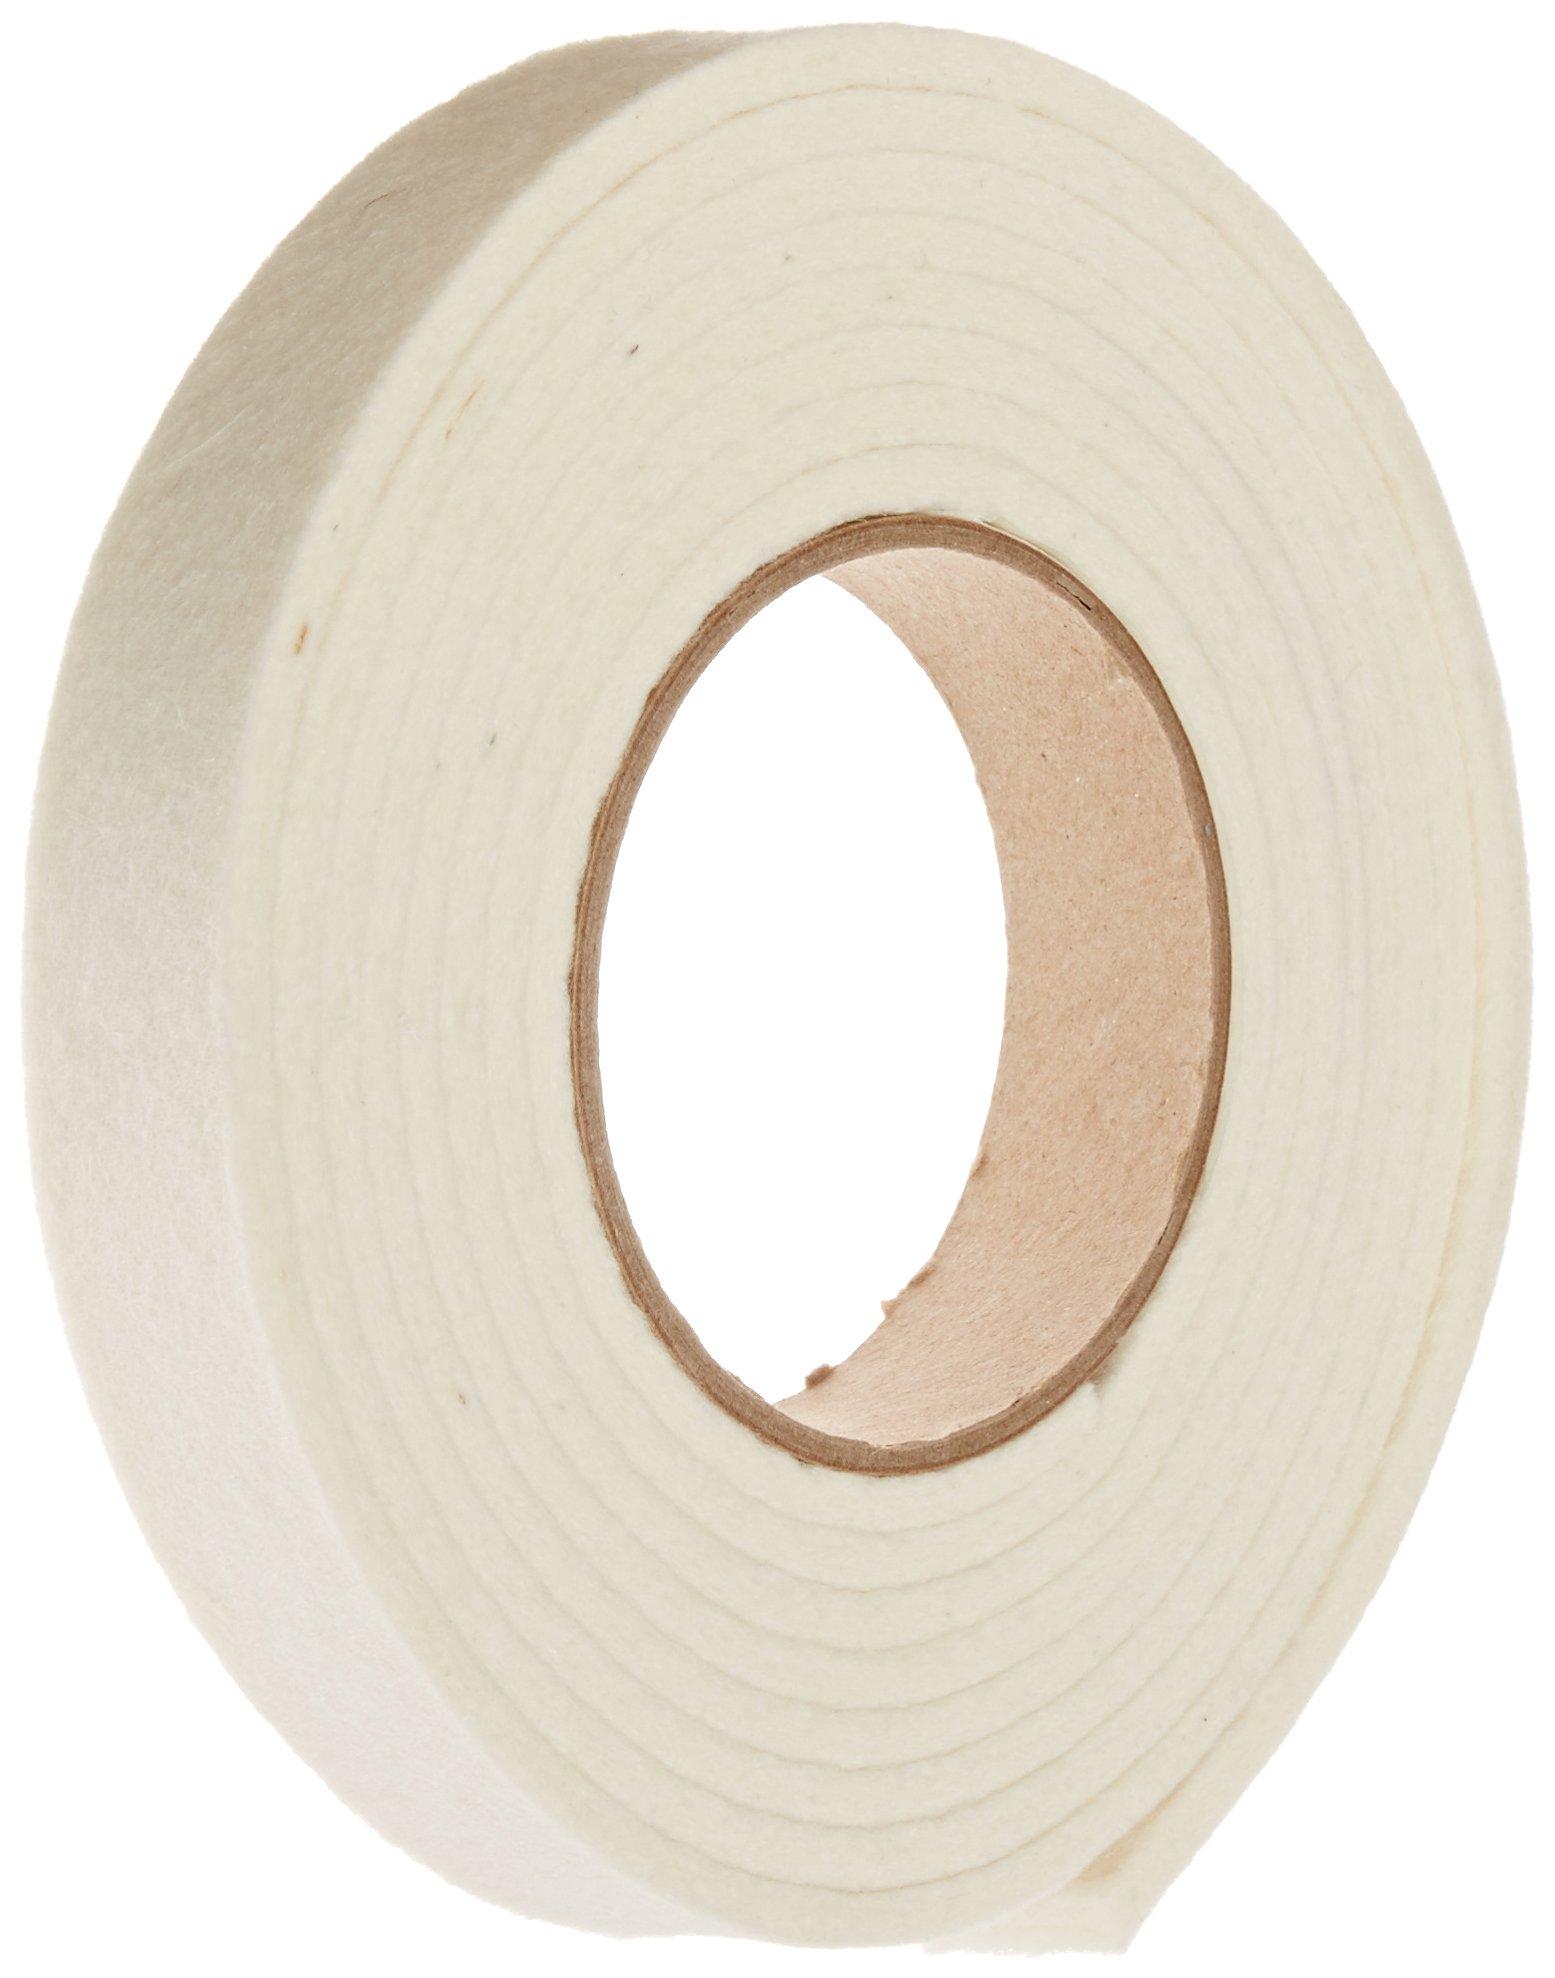 Grade F1 Pressed Wool Felt Strip, White, Meets SAE J314, 3/16'' Thickness, 1'' Width, 10' Length